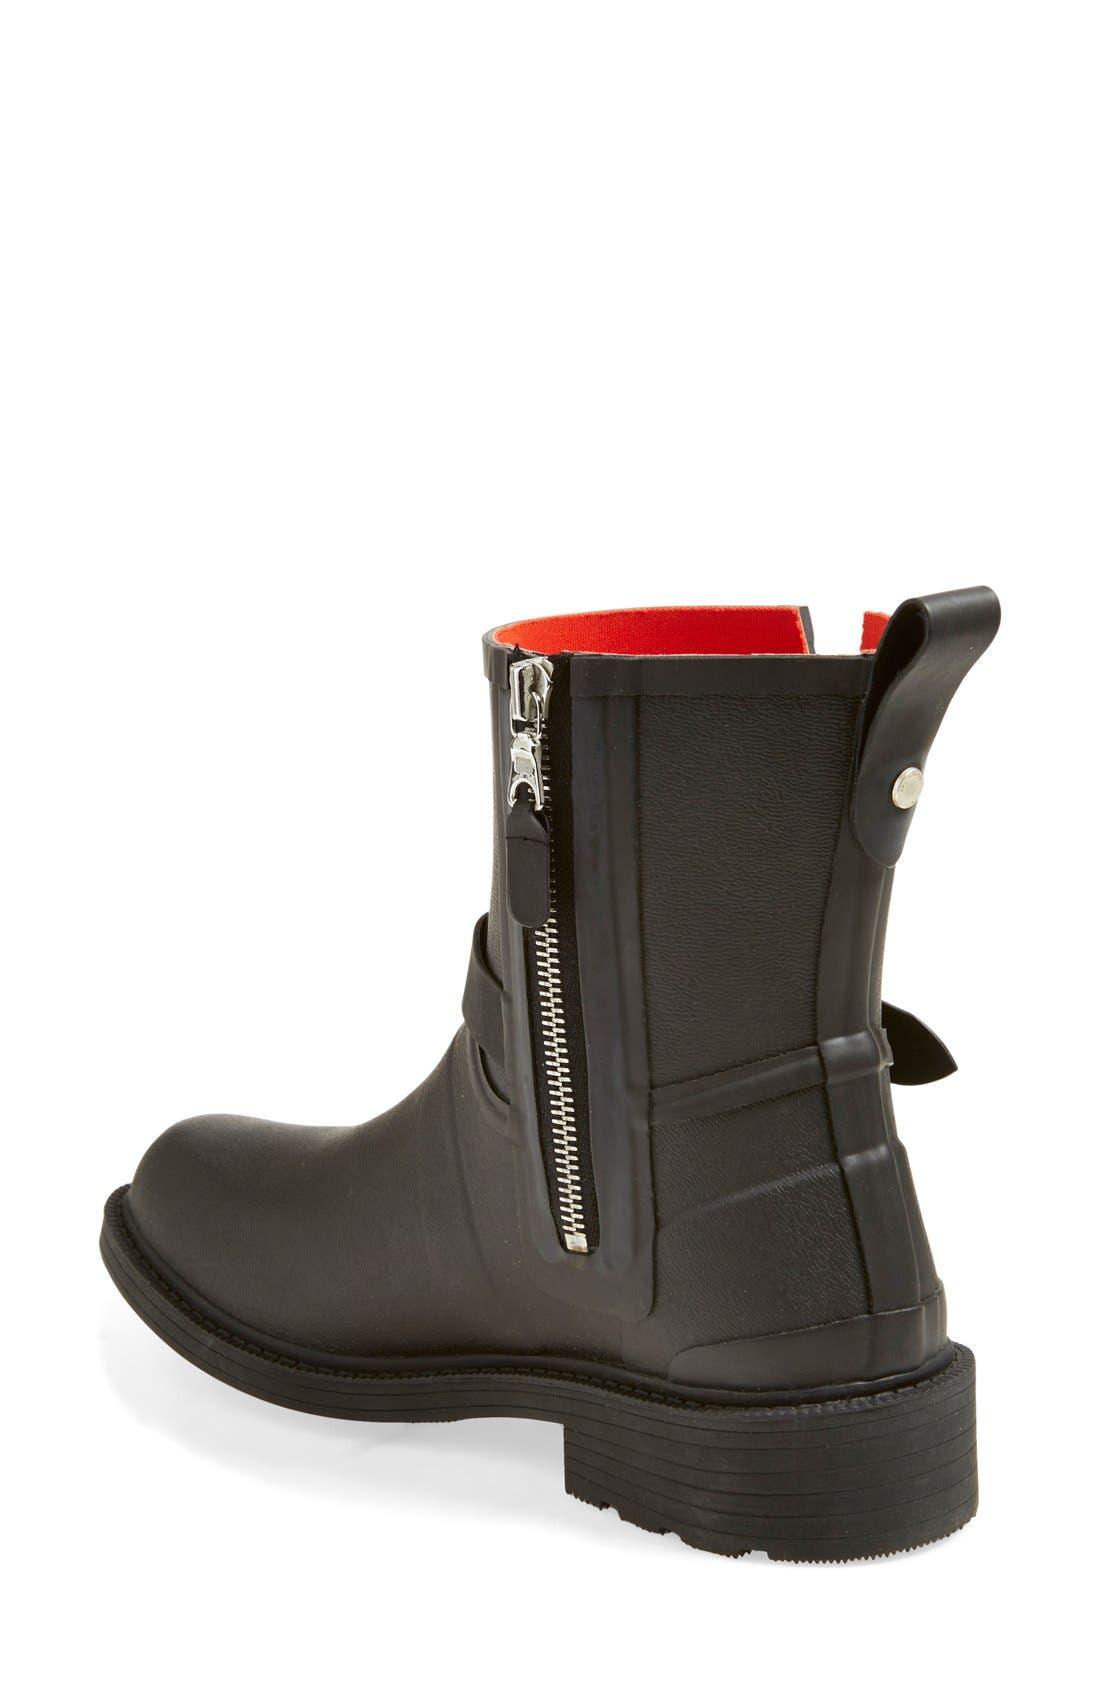 5601ea3b59c Women s Rag   Bone Boots